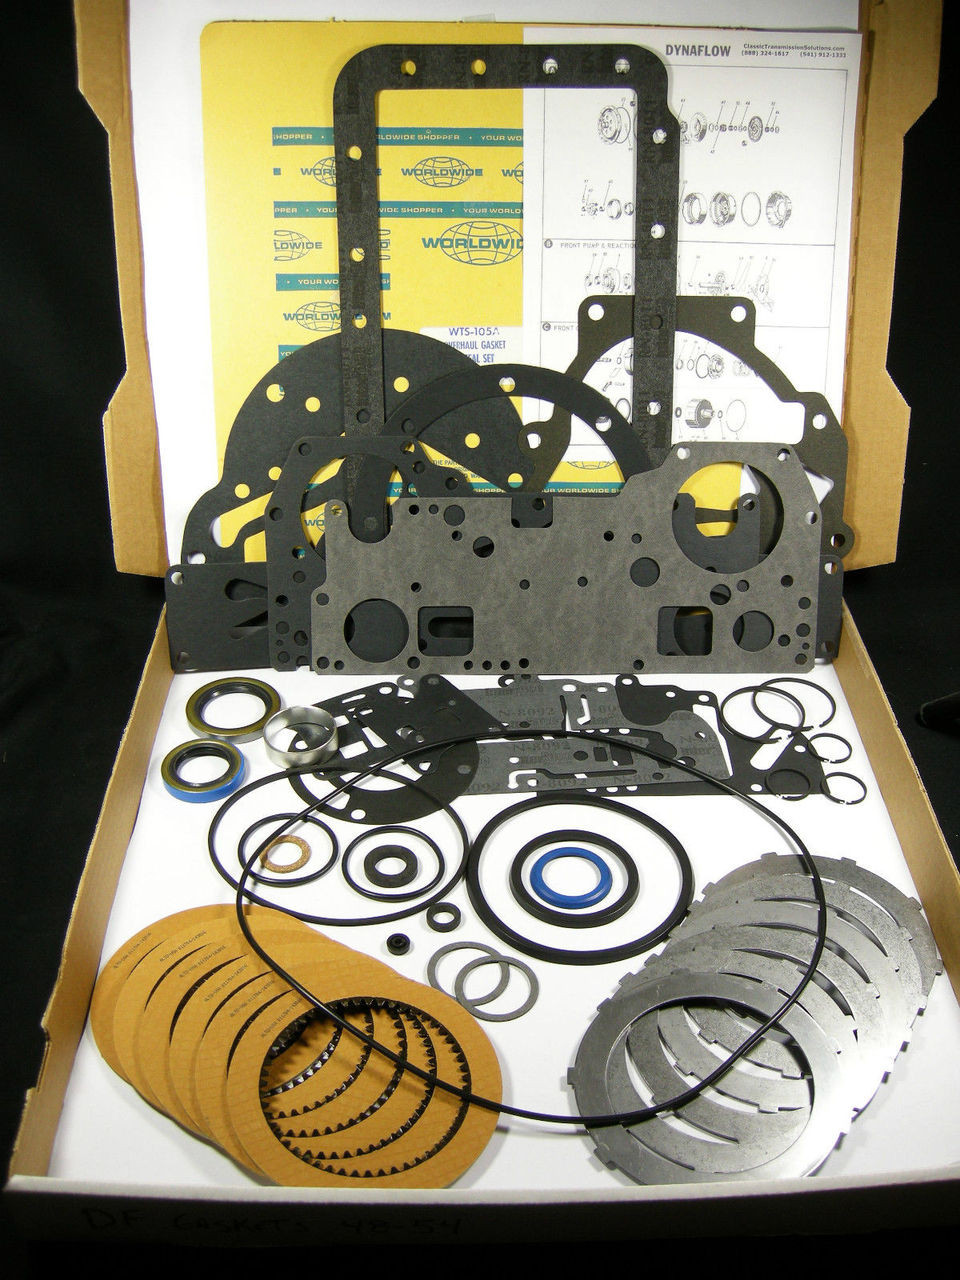 BUICK DYNAFLOW Rebuild Part Kit 1959 1960 1961 1962 1963 Transmission Rebuilding